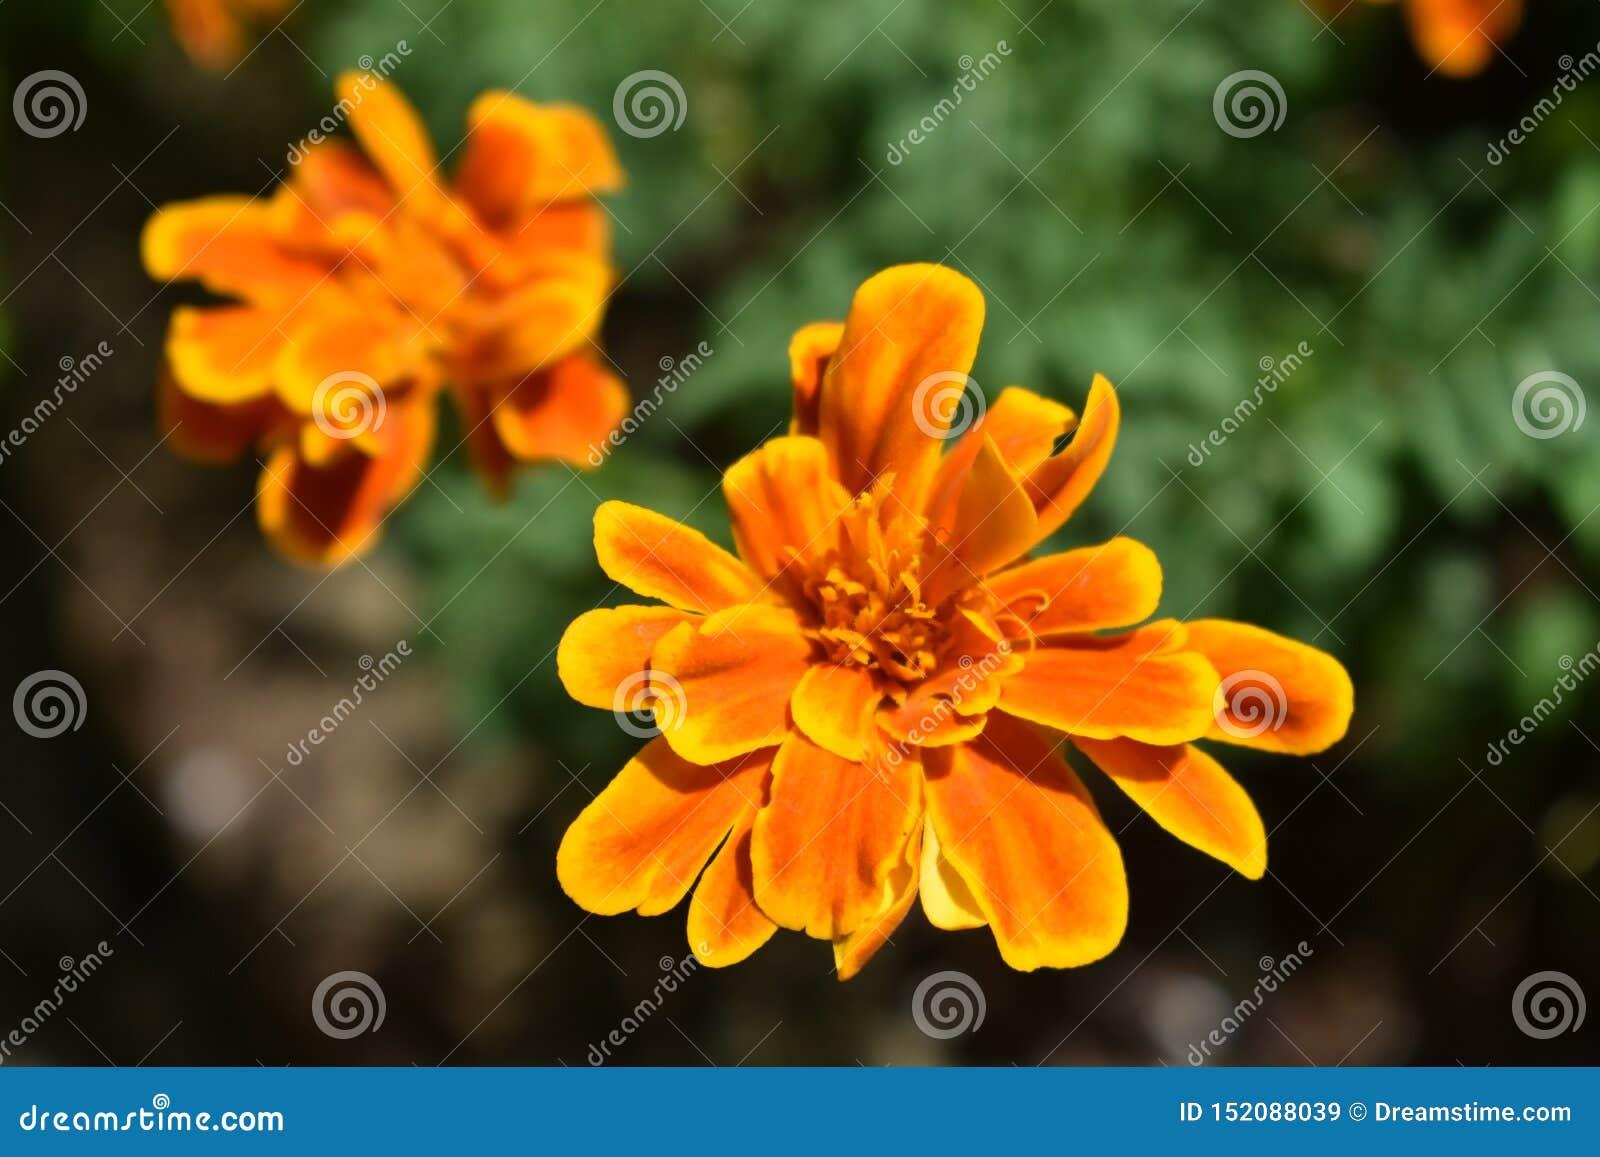 Resplandor solar anaranjado